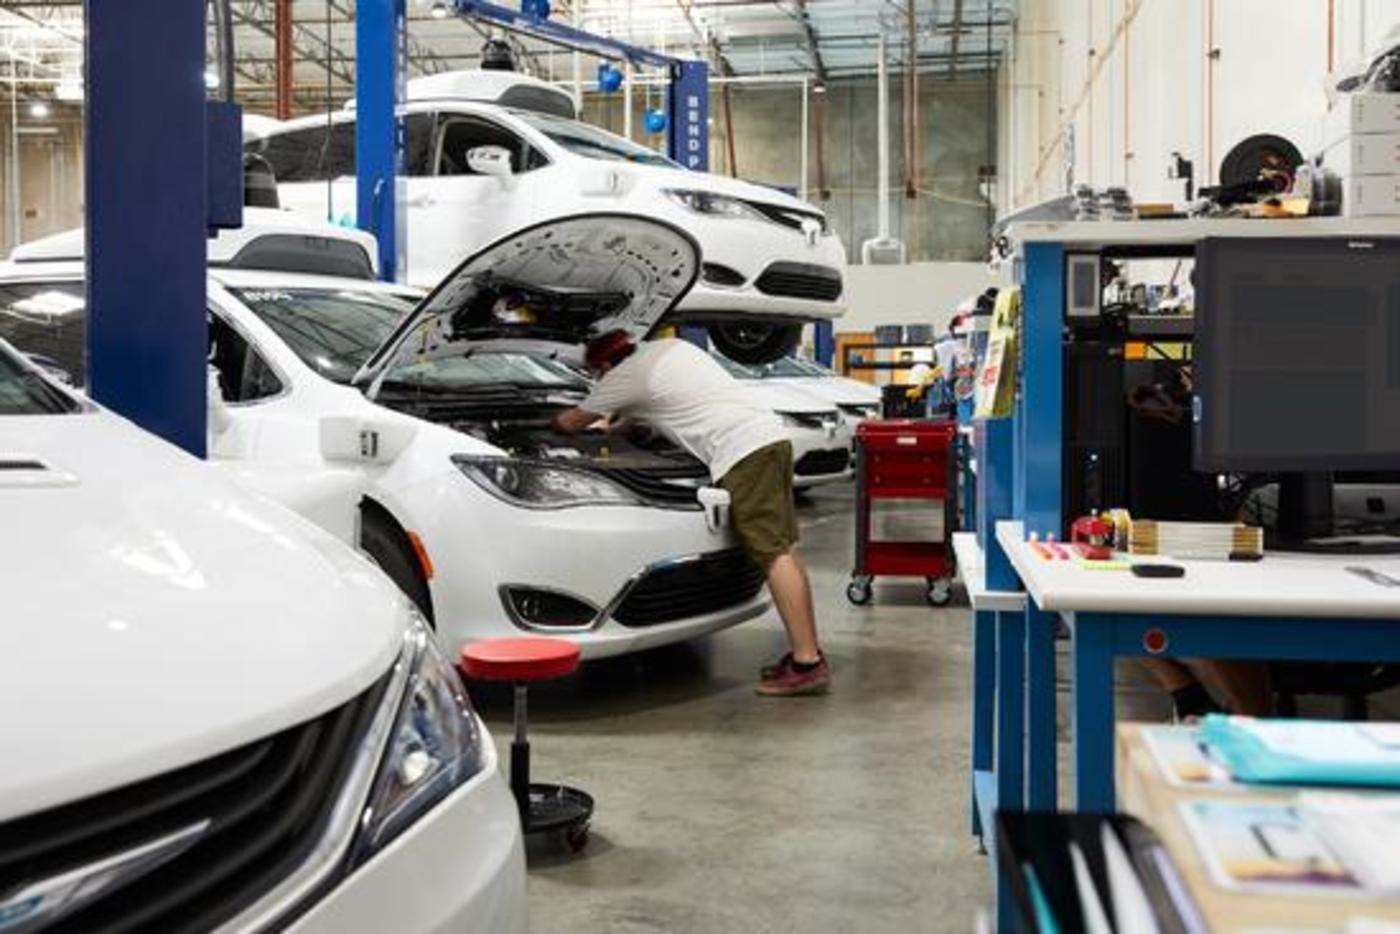 Waymo车库的工作人员在检查车辆